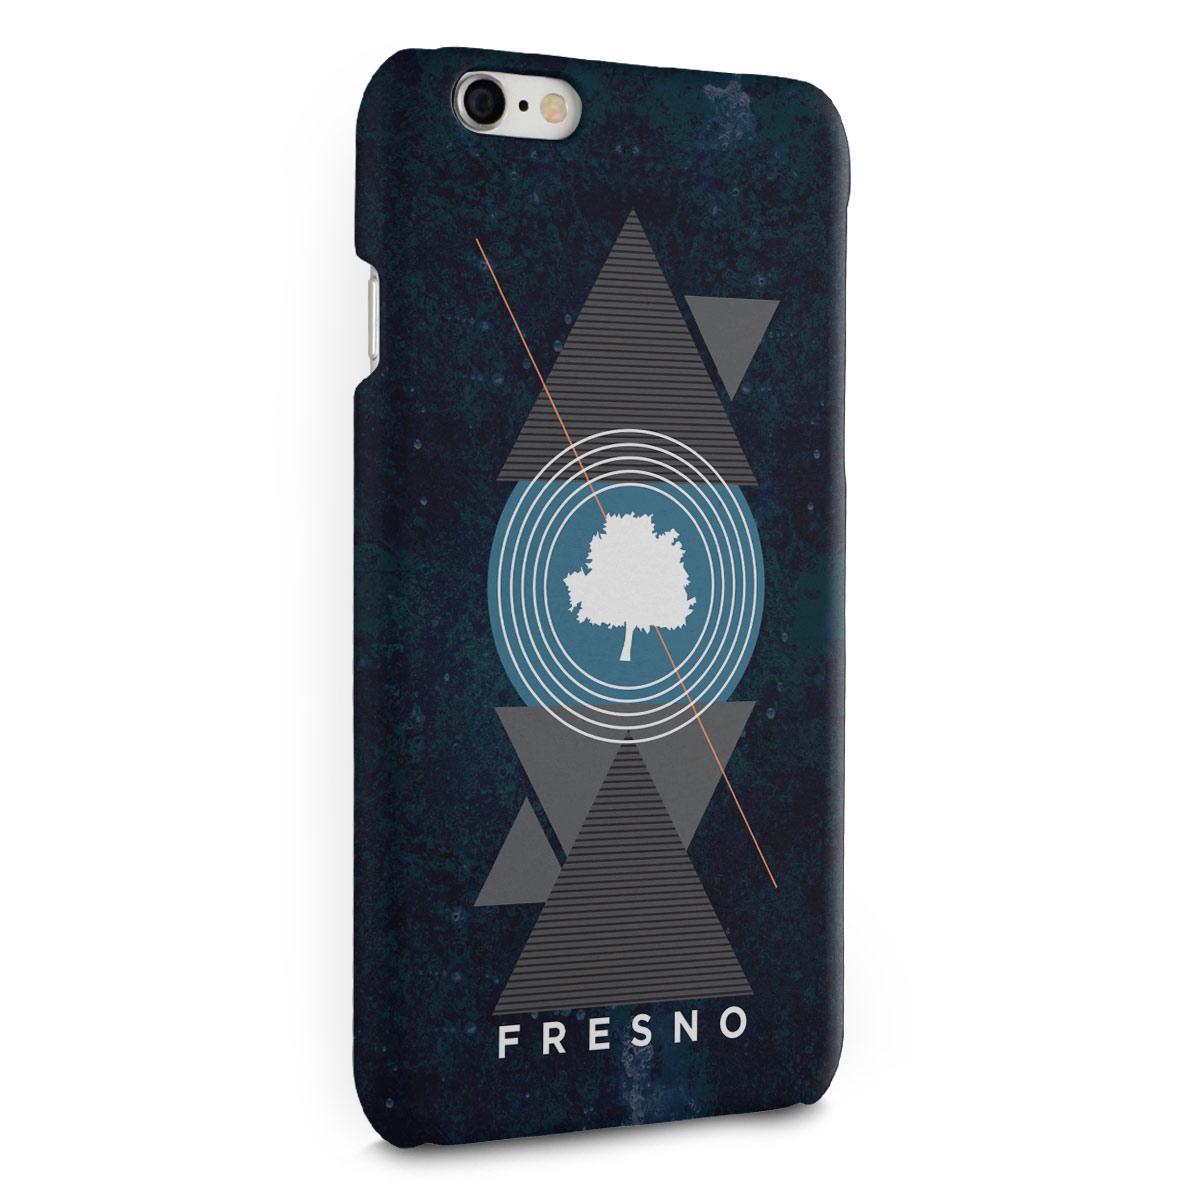 Capa para iPhone 6/6S Plus Fresno Geometric